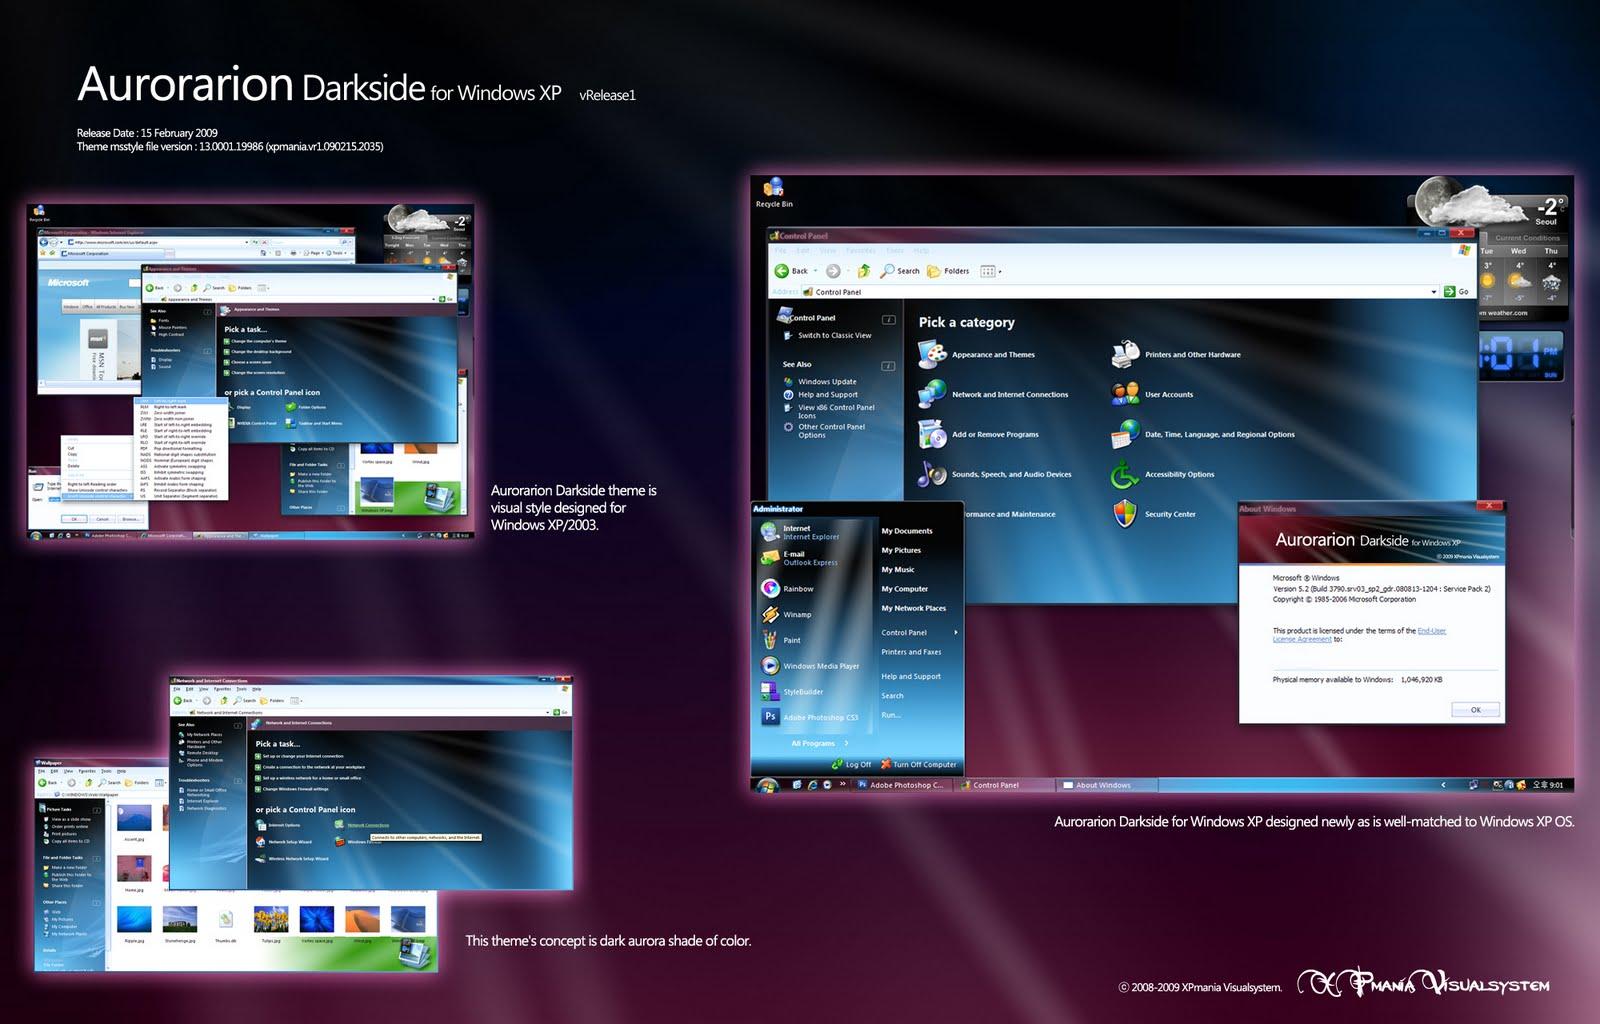 http://4.bp.blogspot.com/-aTEwZwAS_jo/TrbScQkKpUI/AAAAAAAADEc/BA4r7wbS0UI/s1600/Aurorarion_Darkside_for_XP.jpg